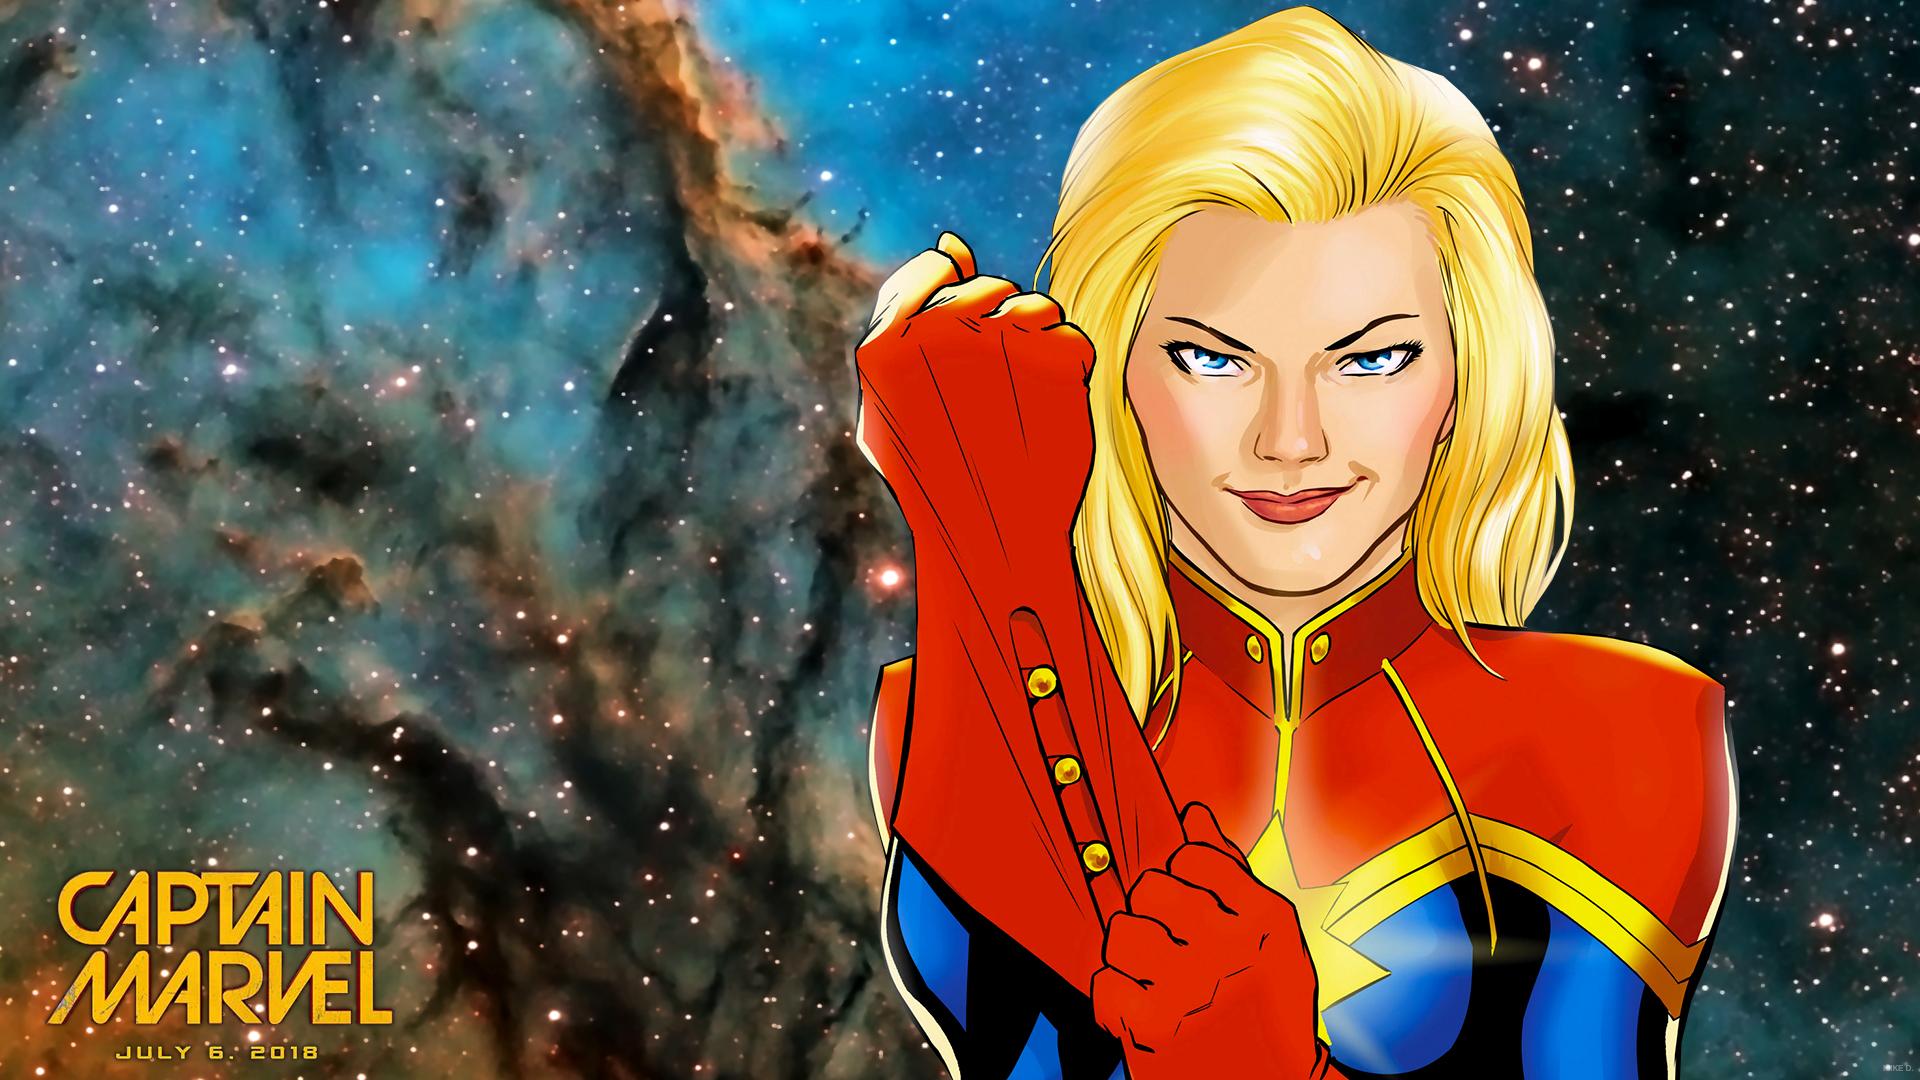 Images Of Captain Marvel Dc Wallpaper Hd Calto